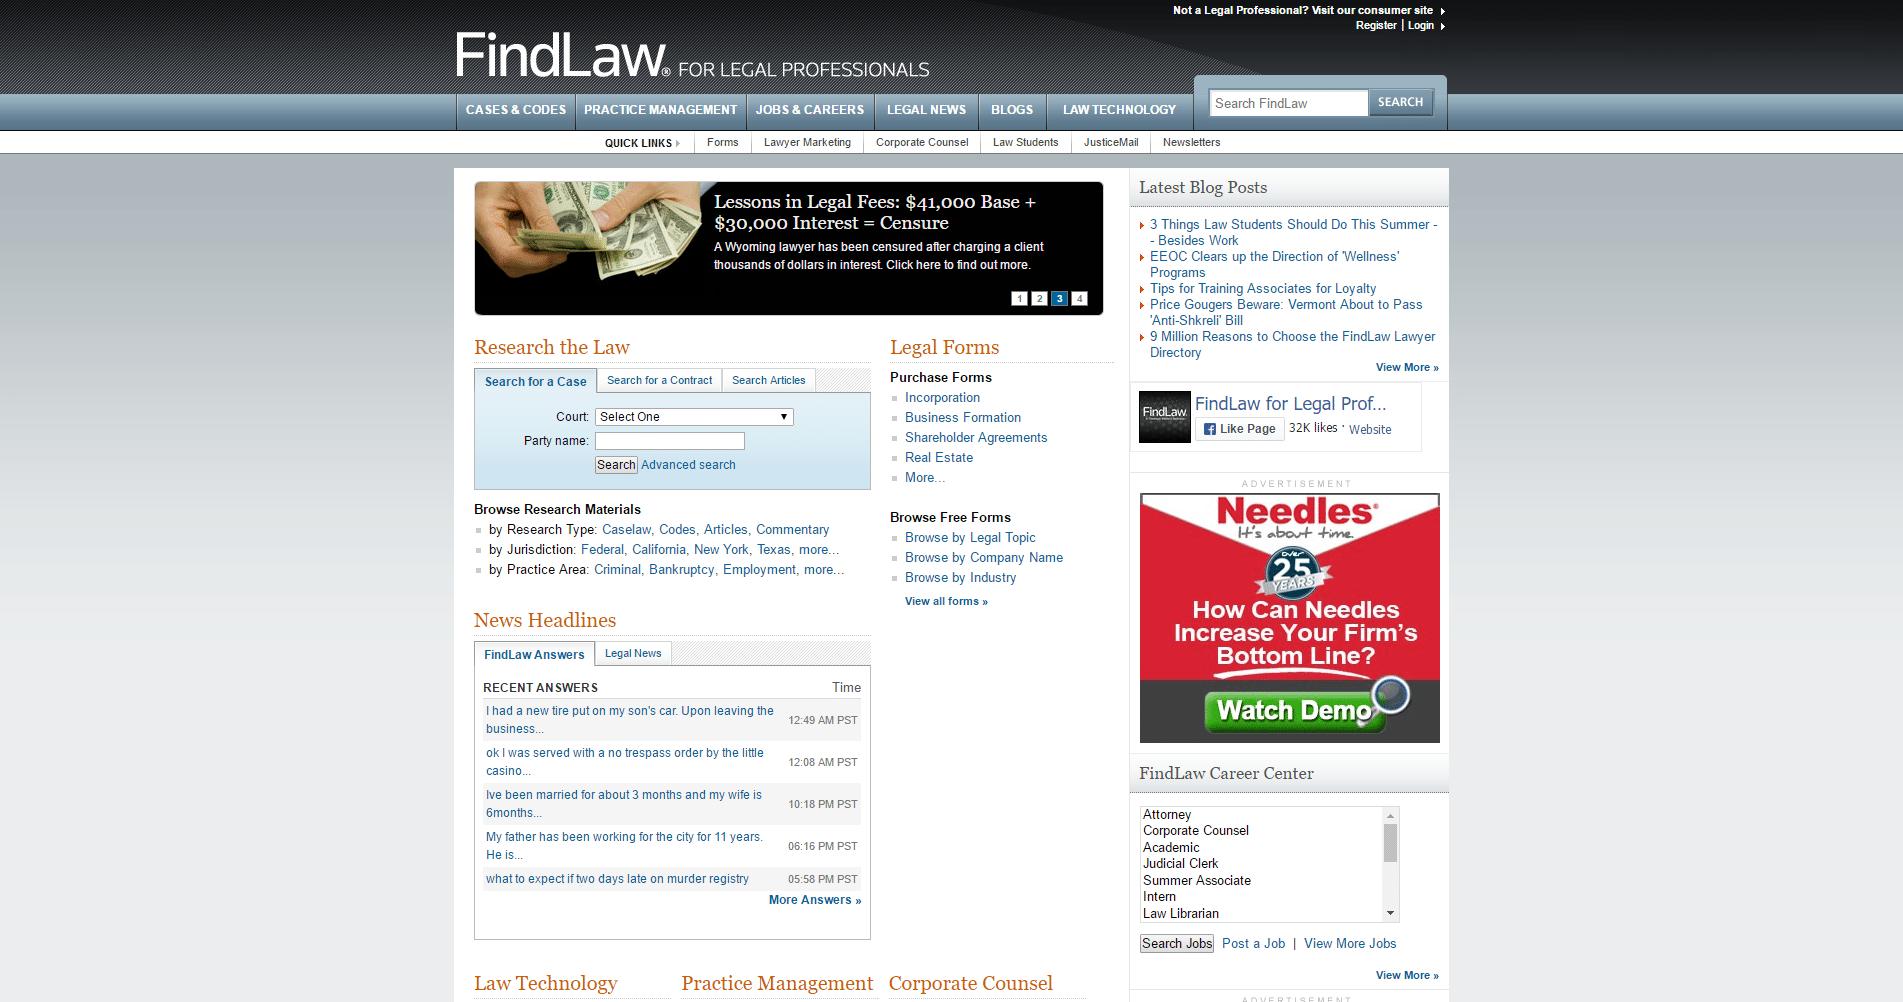 FindLaw large